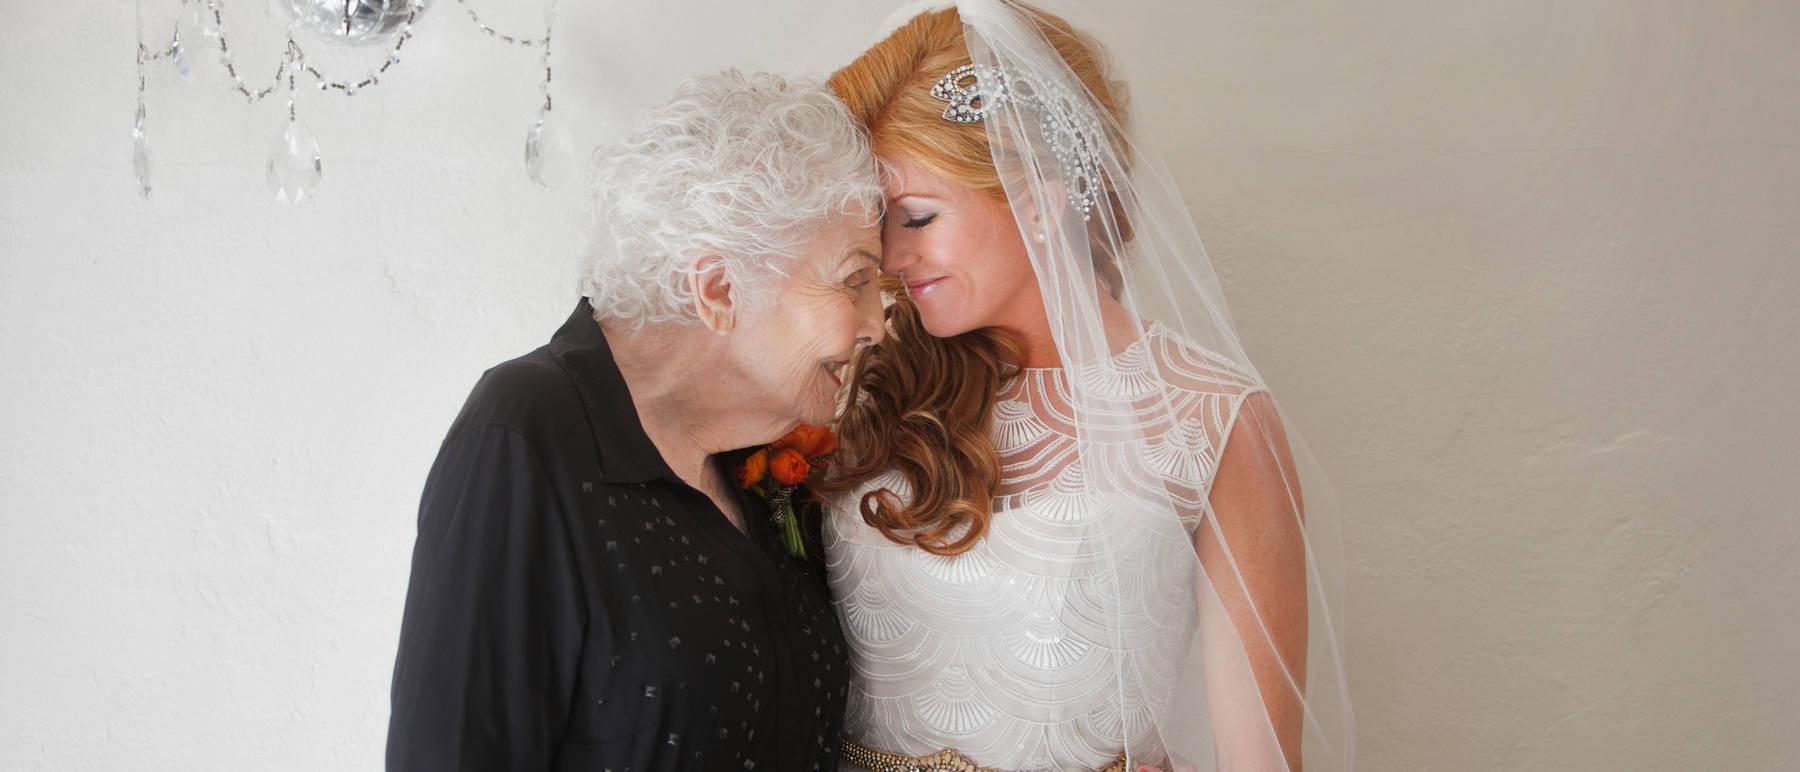 johnandjoseph-wedding-photographer-hz-slider-125